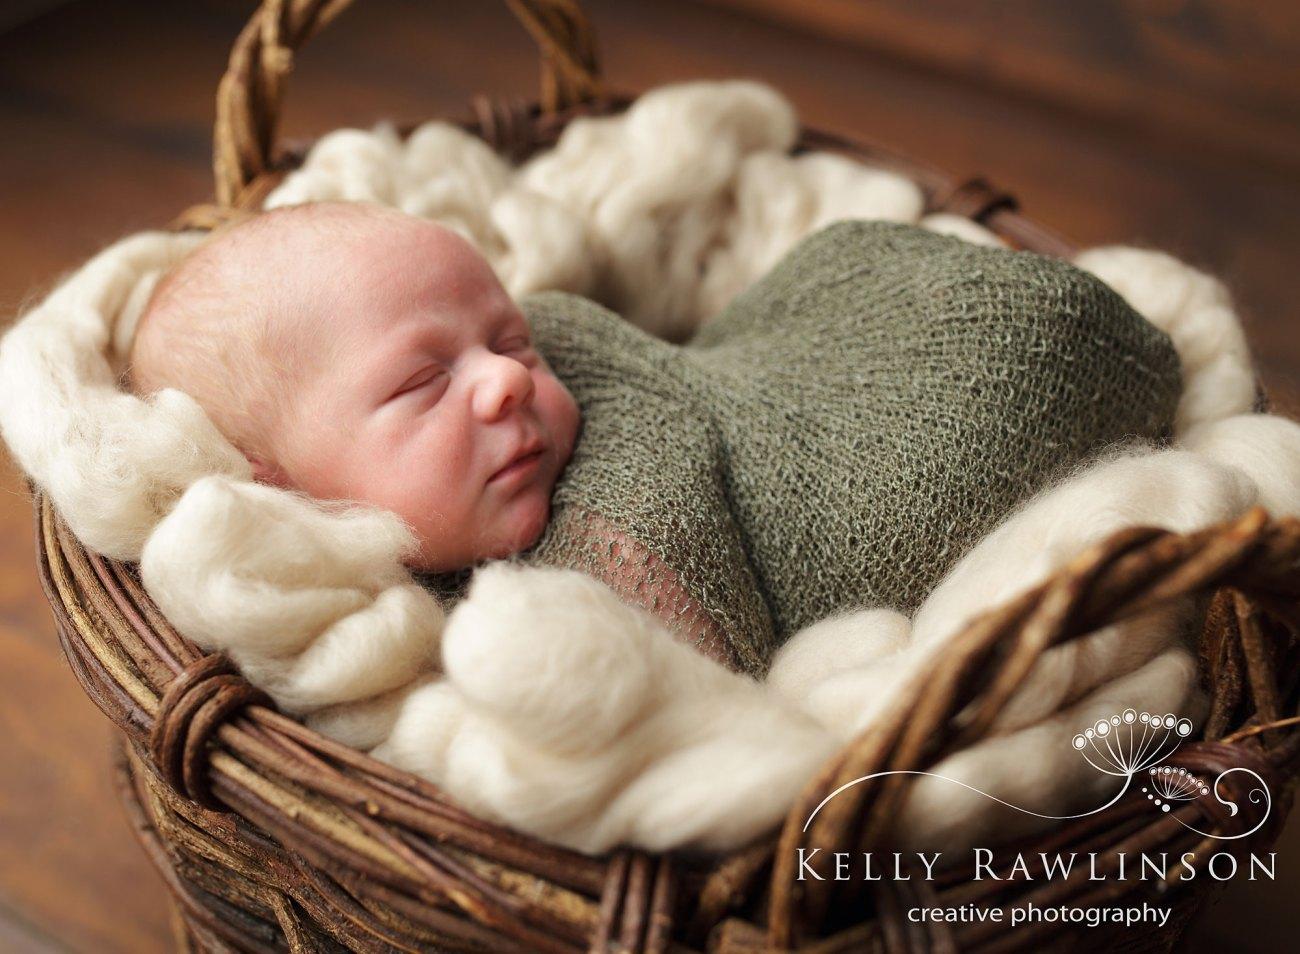 newborn, baby, infant, photo, pic, photos, photographer, photography